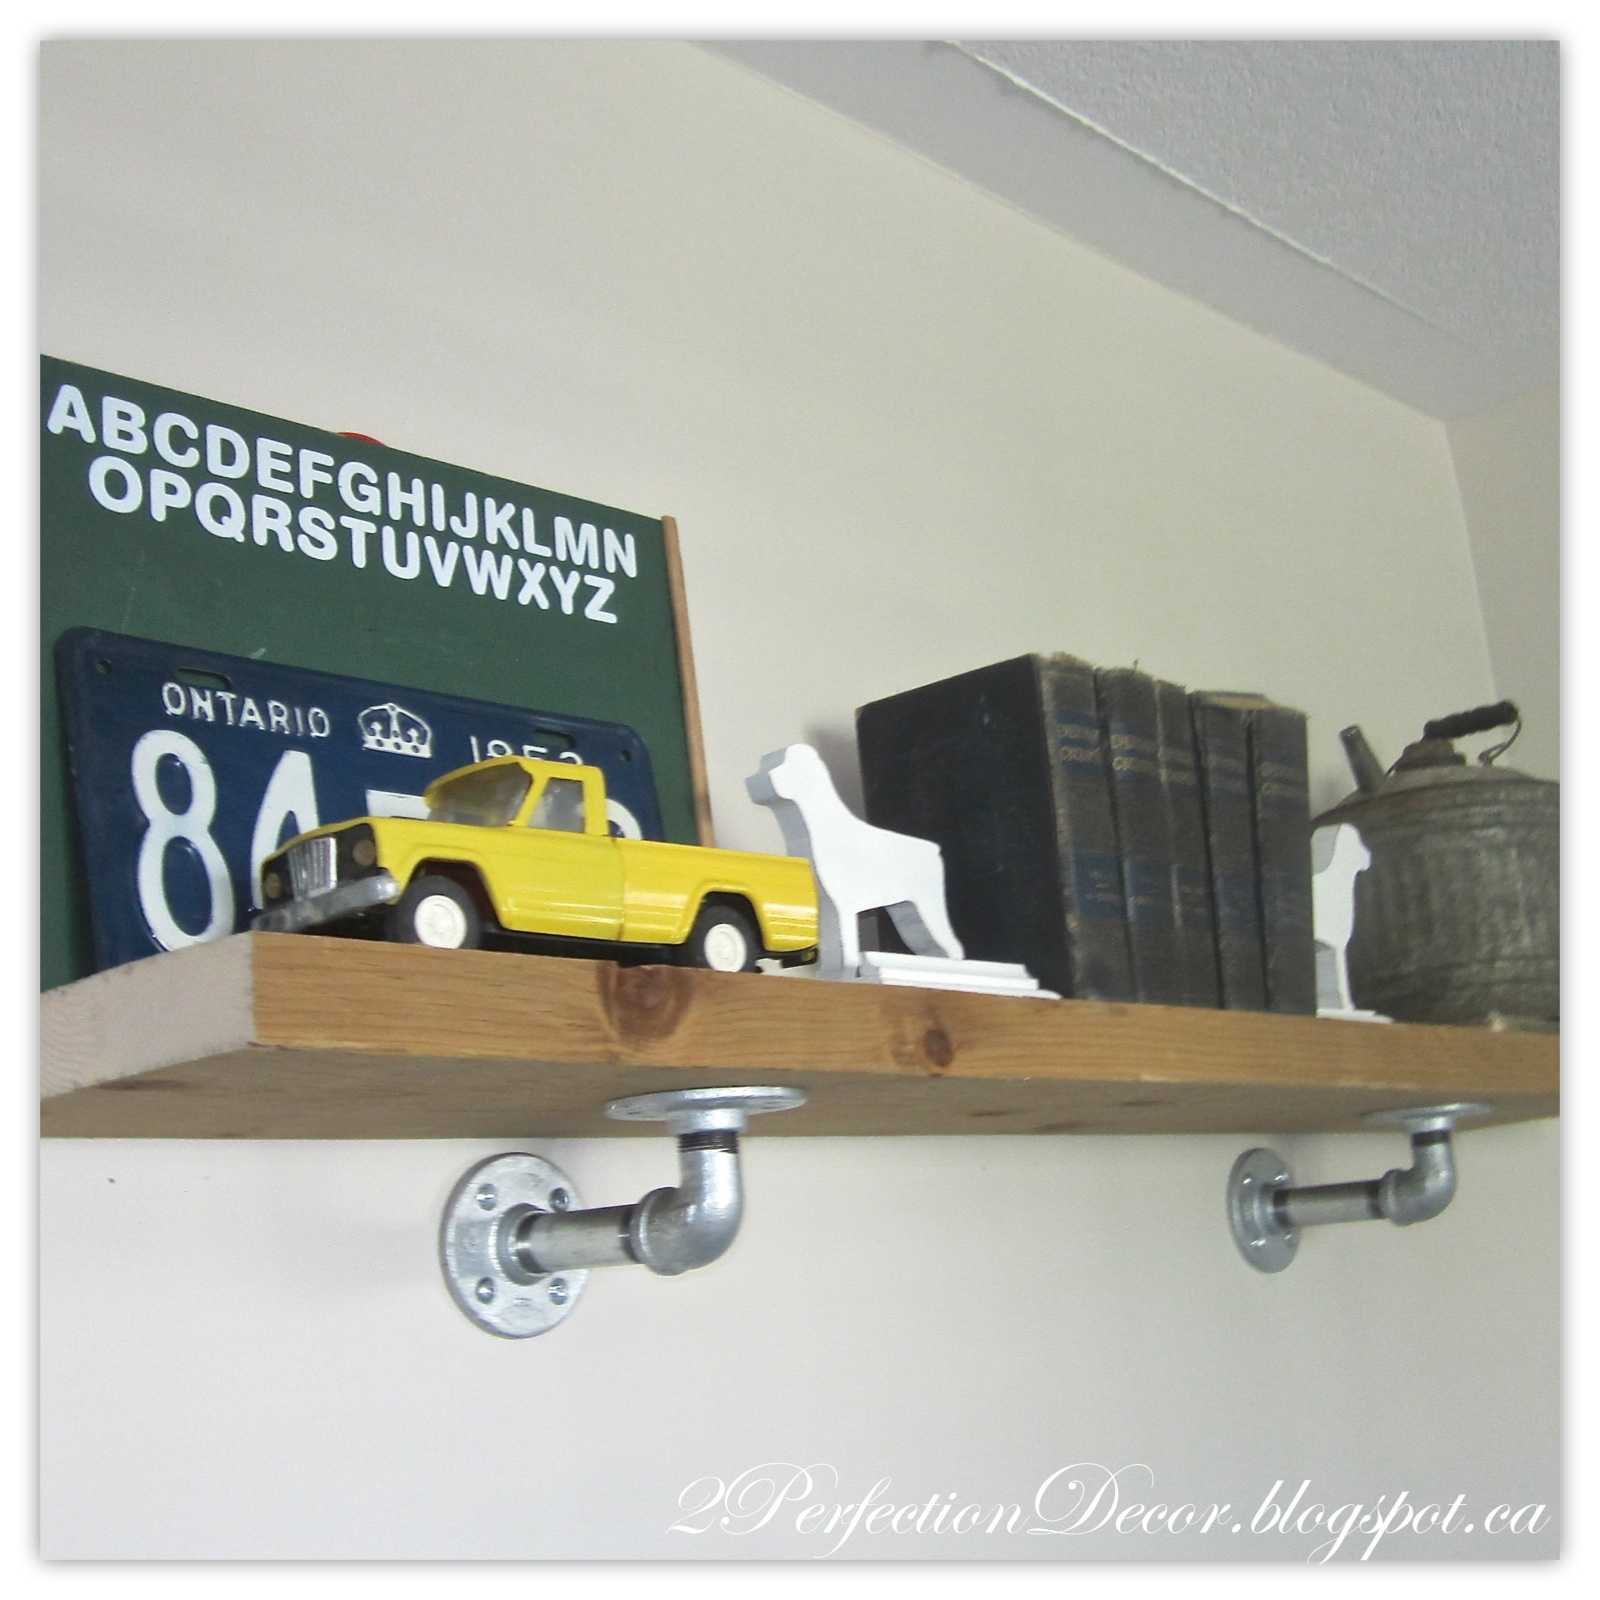 Diy Industrial Decor: 2Perfection Decor: DIY Industrial Pipe Shelf